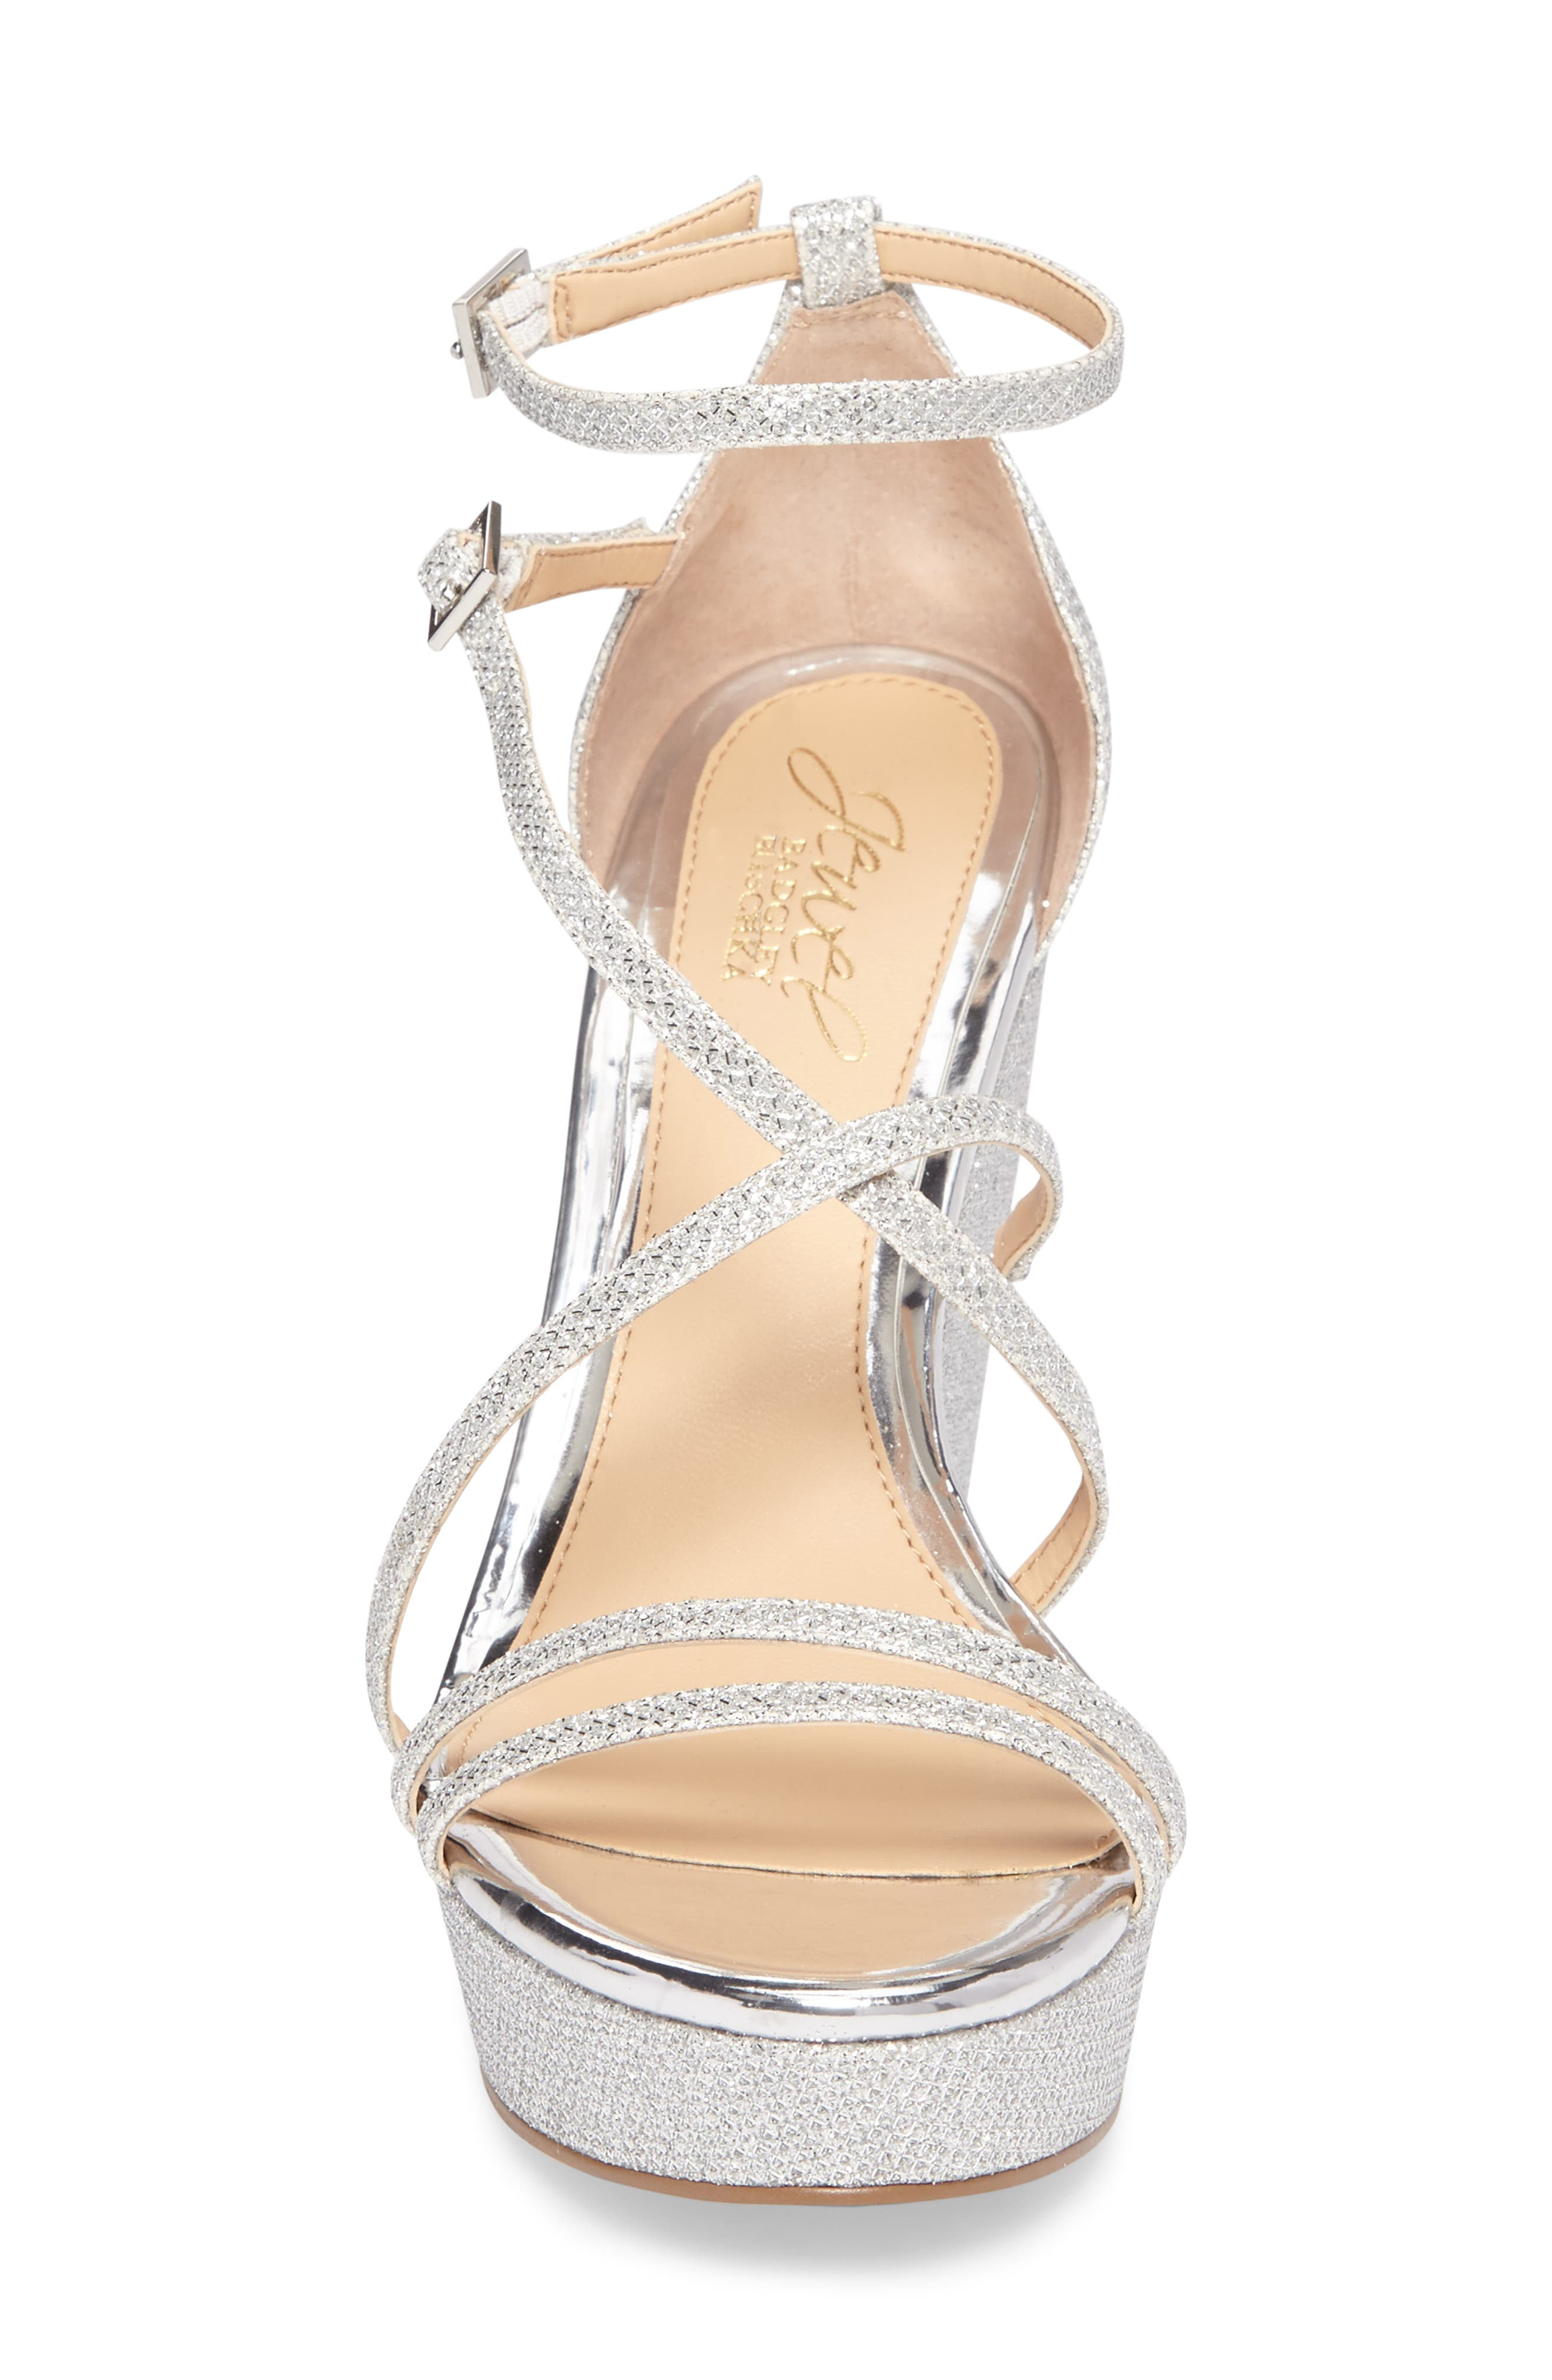 Tatsu Wedge Sandal,                             Alternate thumbnail 4, color,                             Silver Glitter